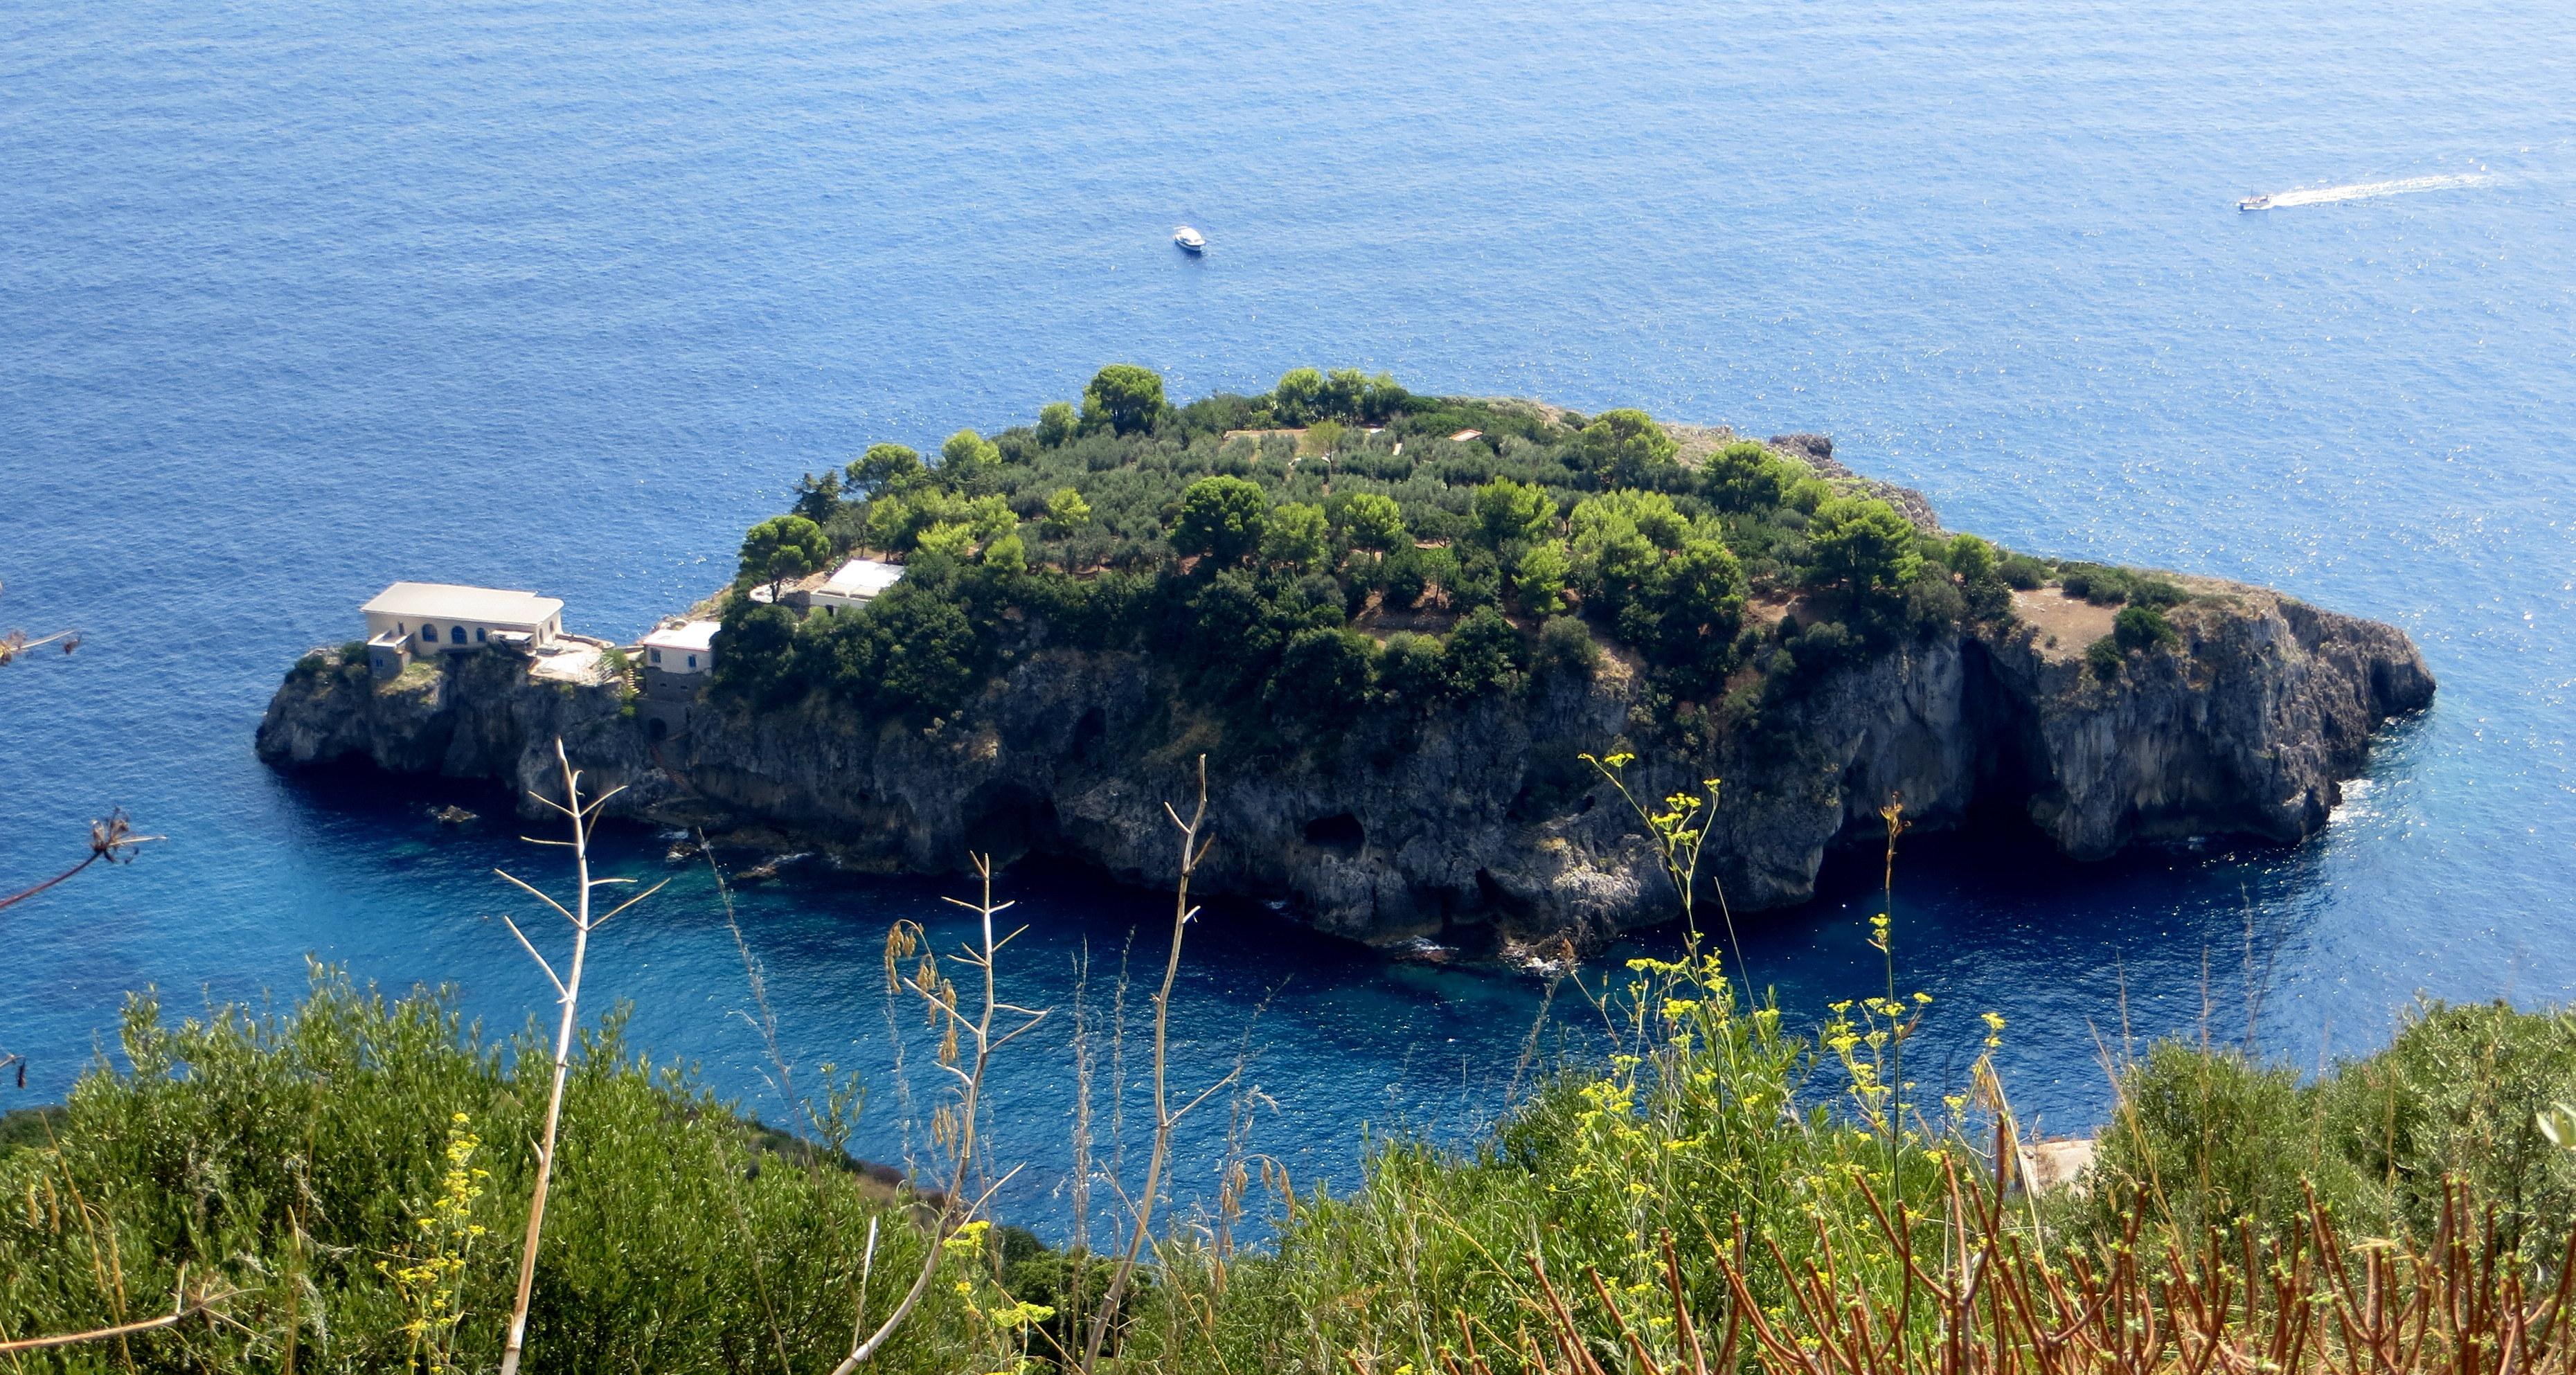 L'Isca island